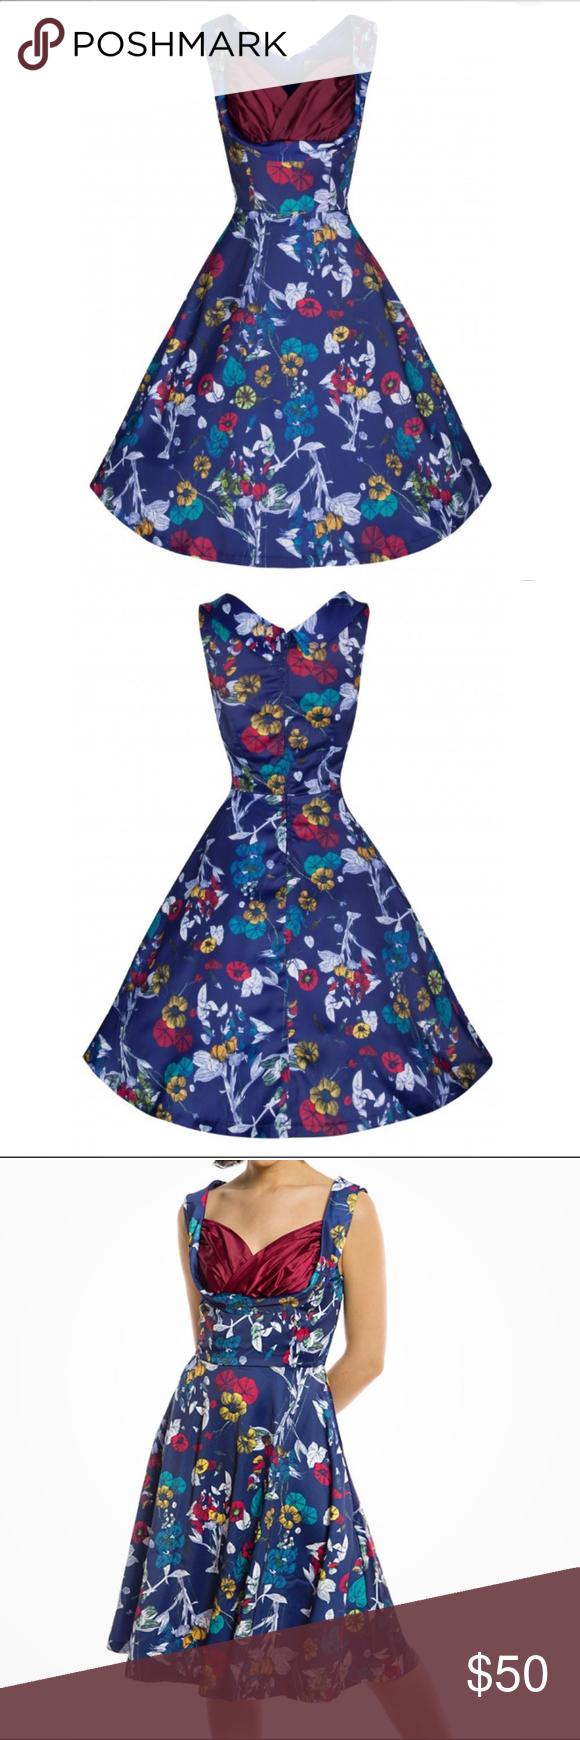 NWT LINDY BOP NAVY WOODLAND OPHELIA DRESS SZ UK26 Brand